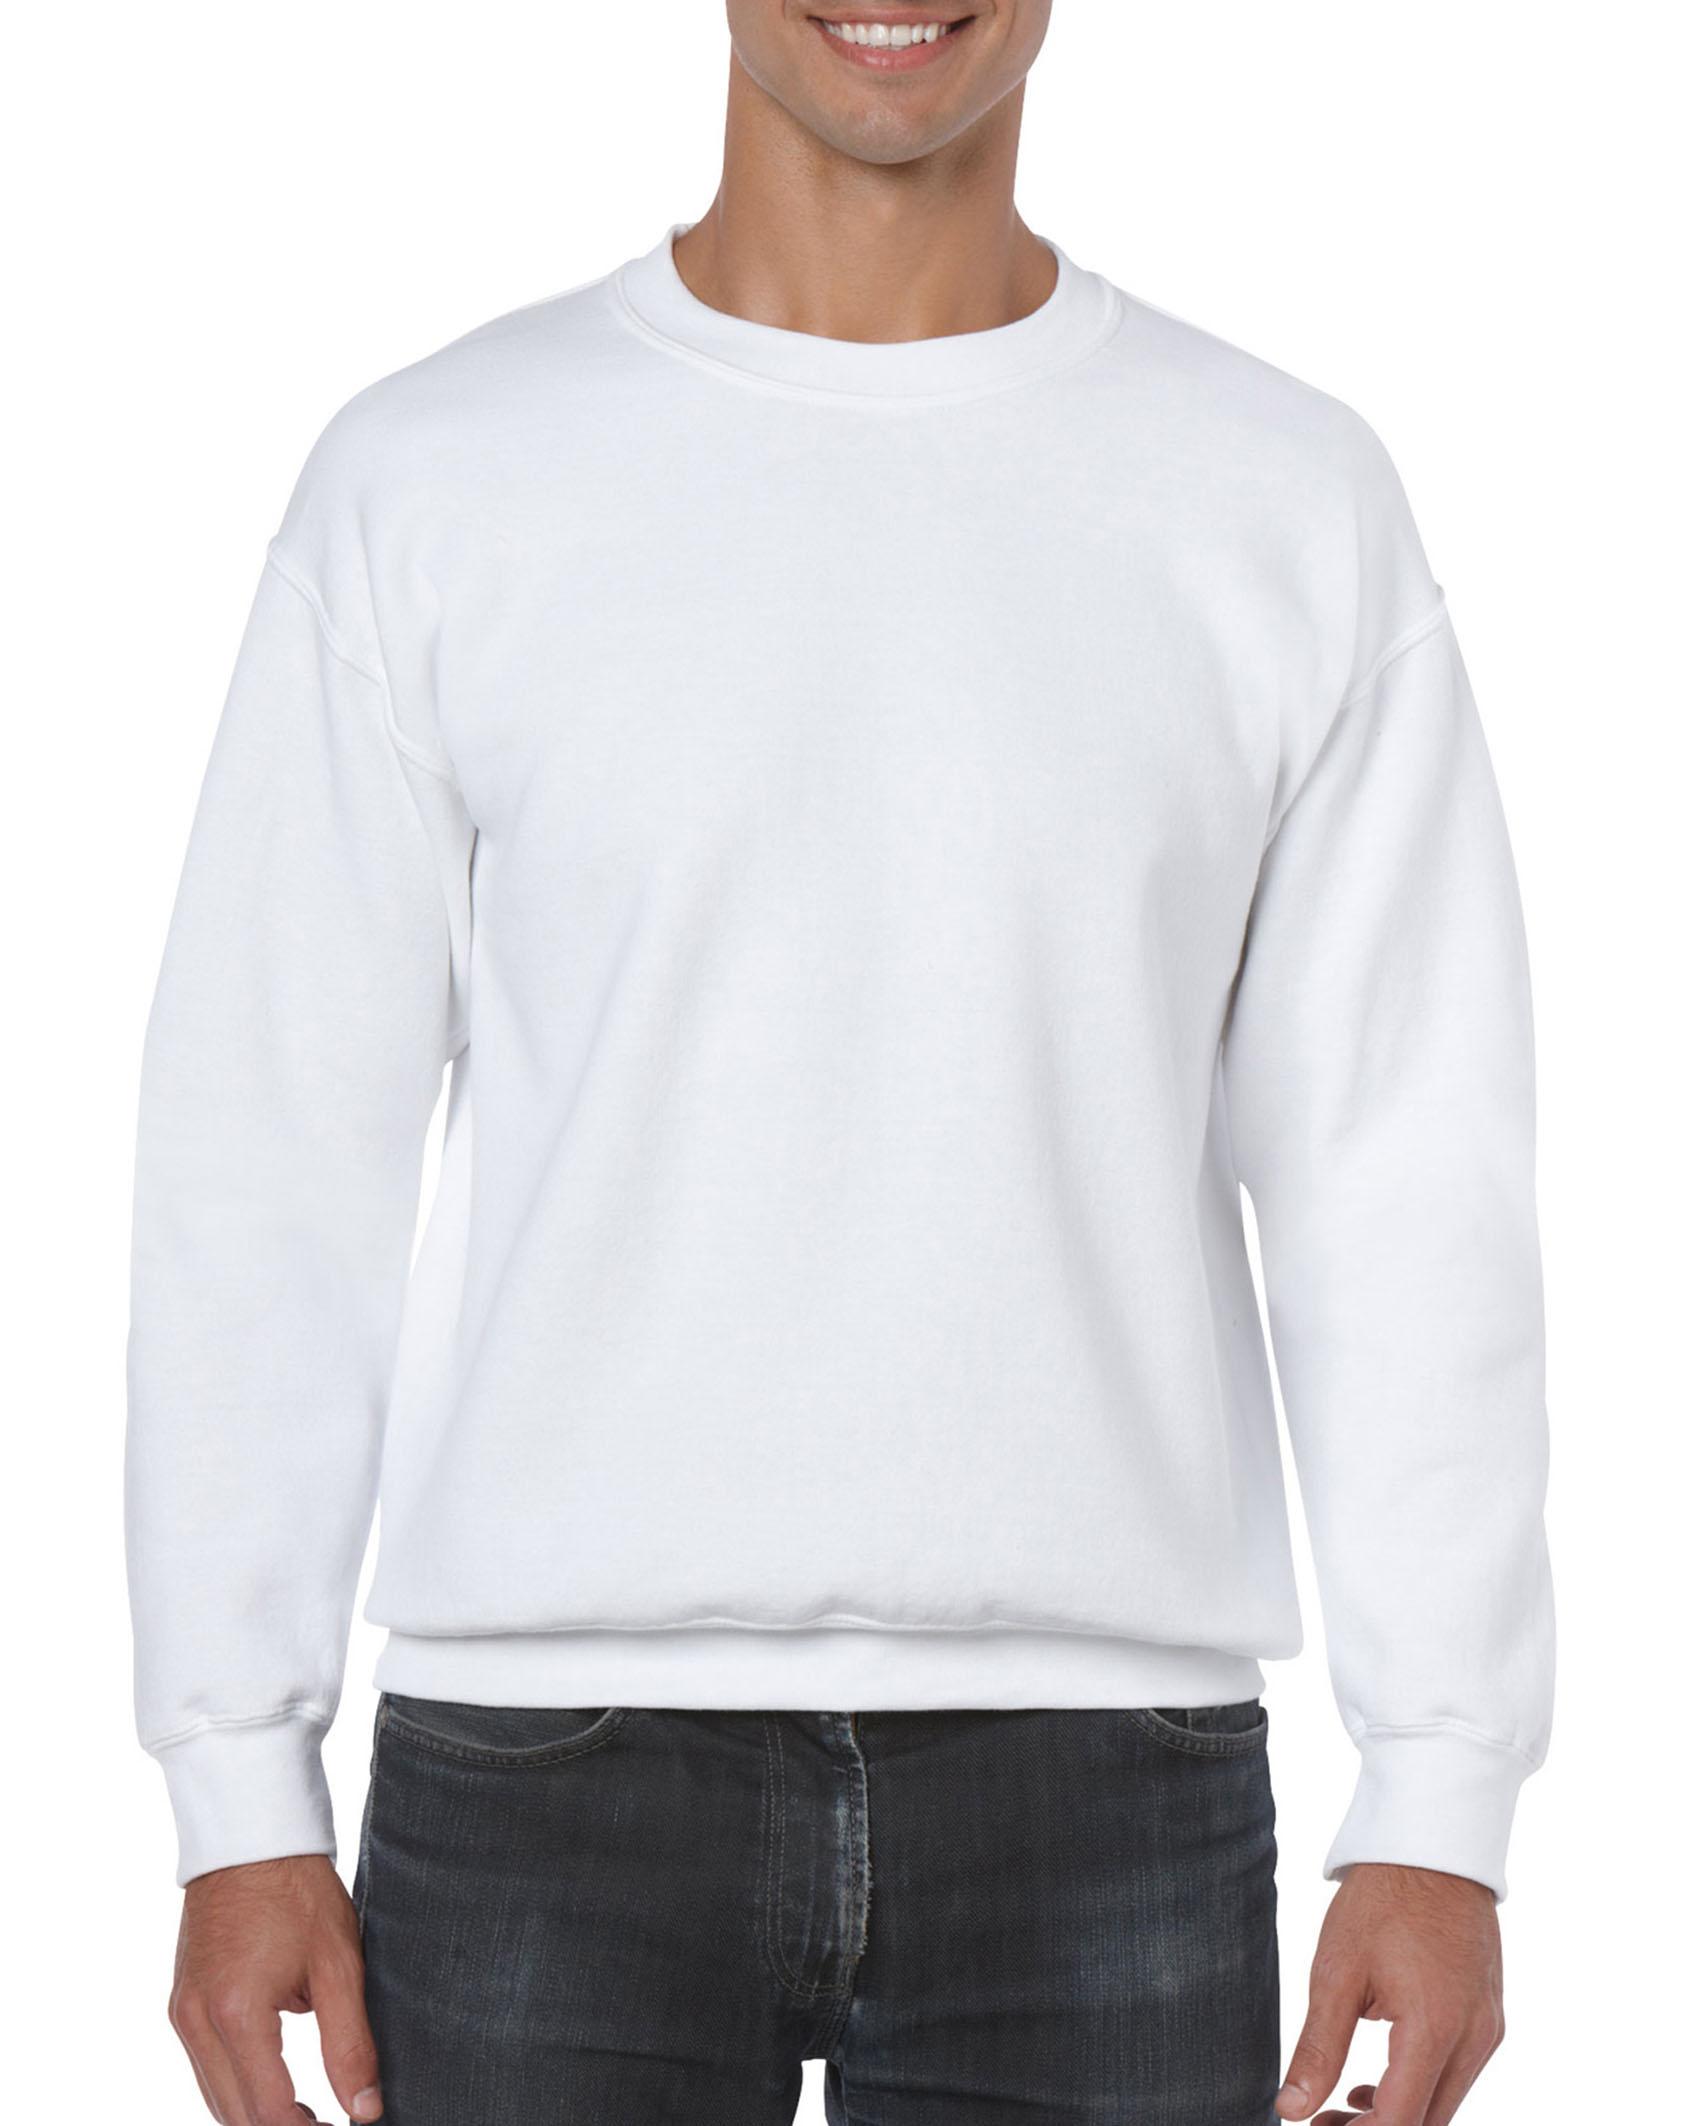 25St Gildan Sweater incl. 1k opdruk (White)